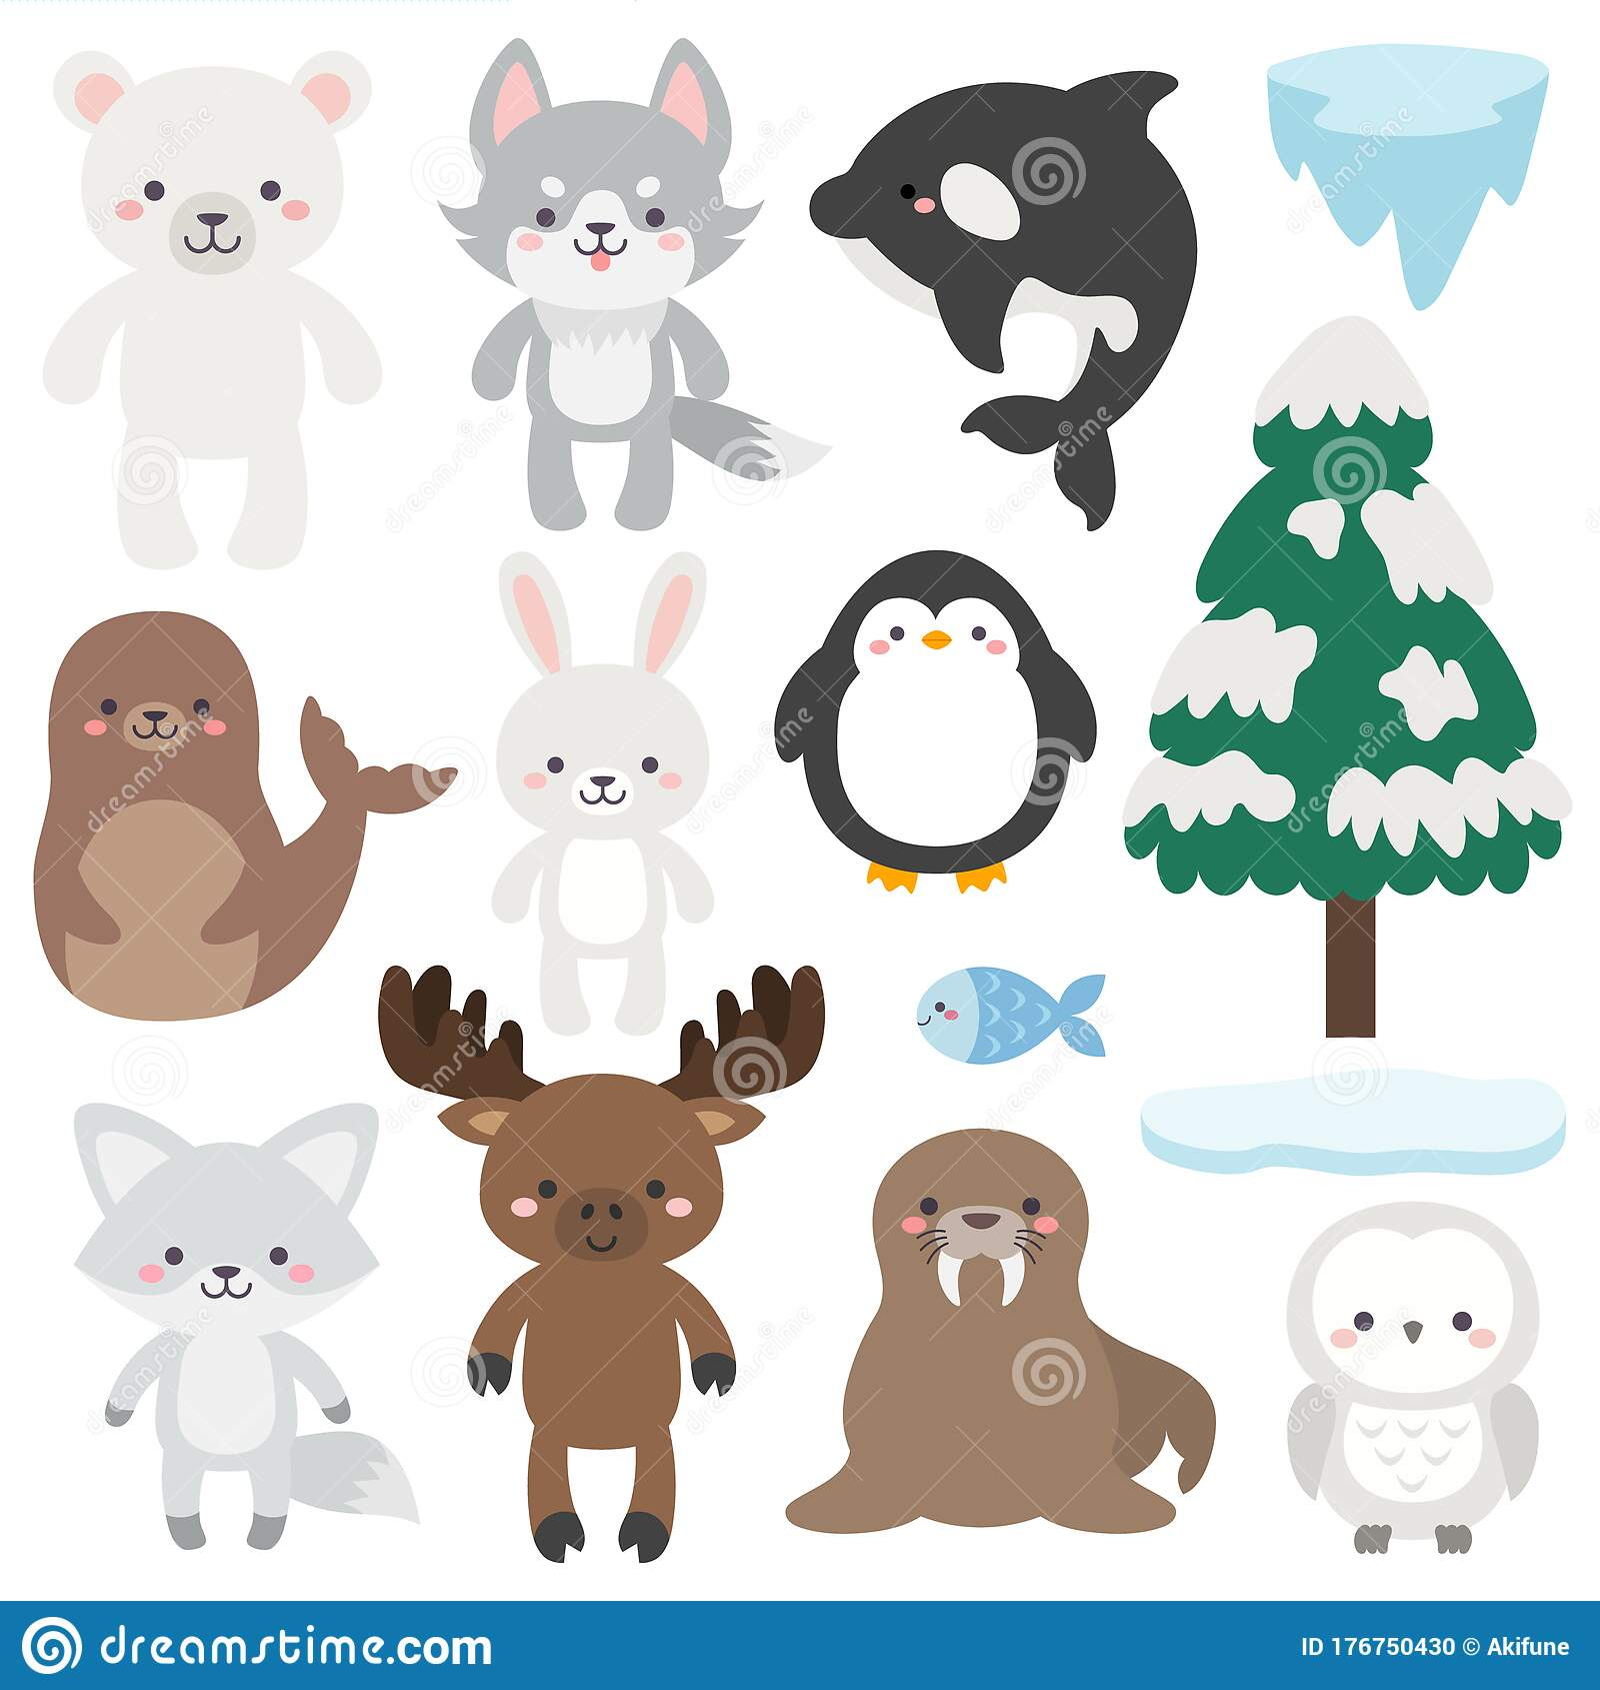 Winter Animals Stock Illustrations 19 105 Winter Animals Stock Illustrations Vectors Clipart Dreamstime